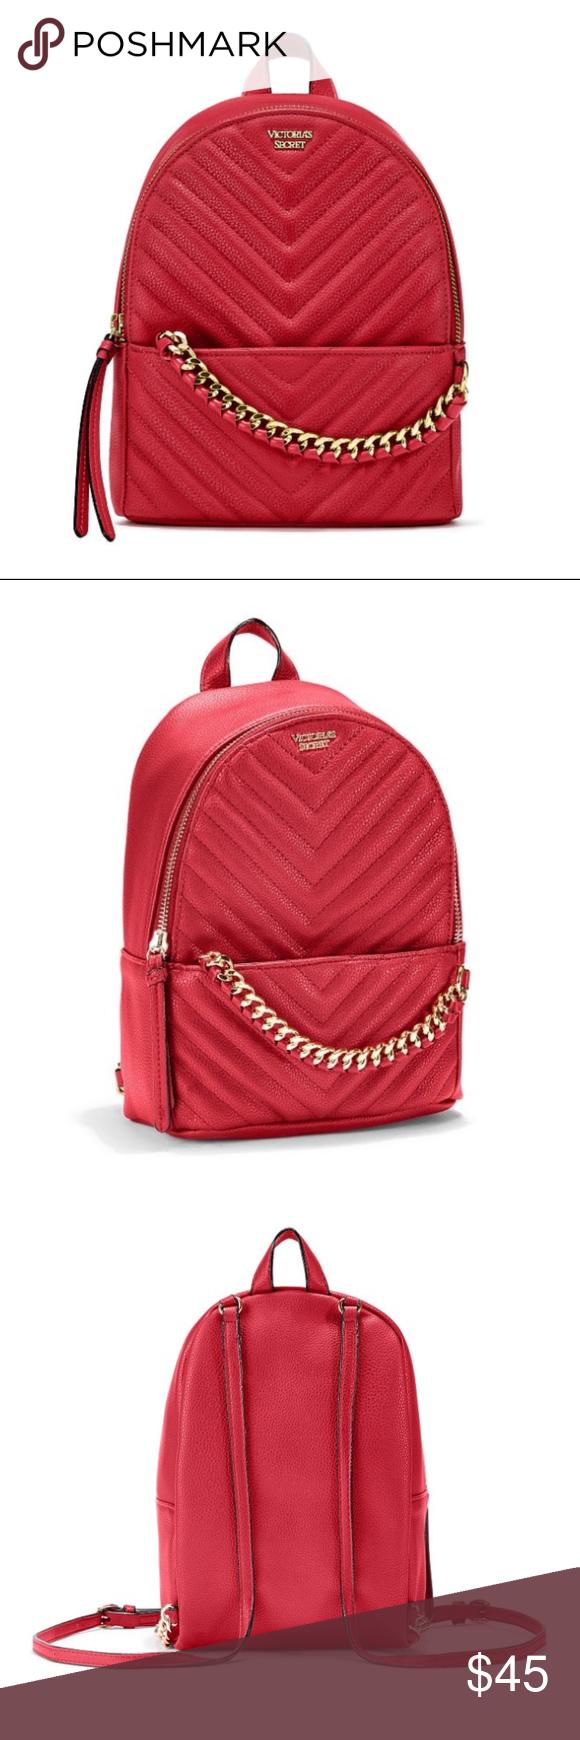 1698e8eb42 Victoria s Secret Pebbled V-Quilt Small Backpack NWT Still in Protective  Plastic Victoria s Secret Pebbled V-Quilt Small City Backpack - Red.